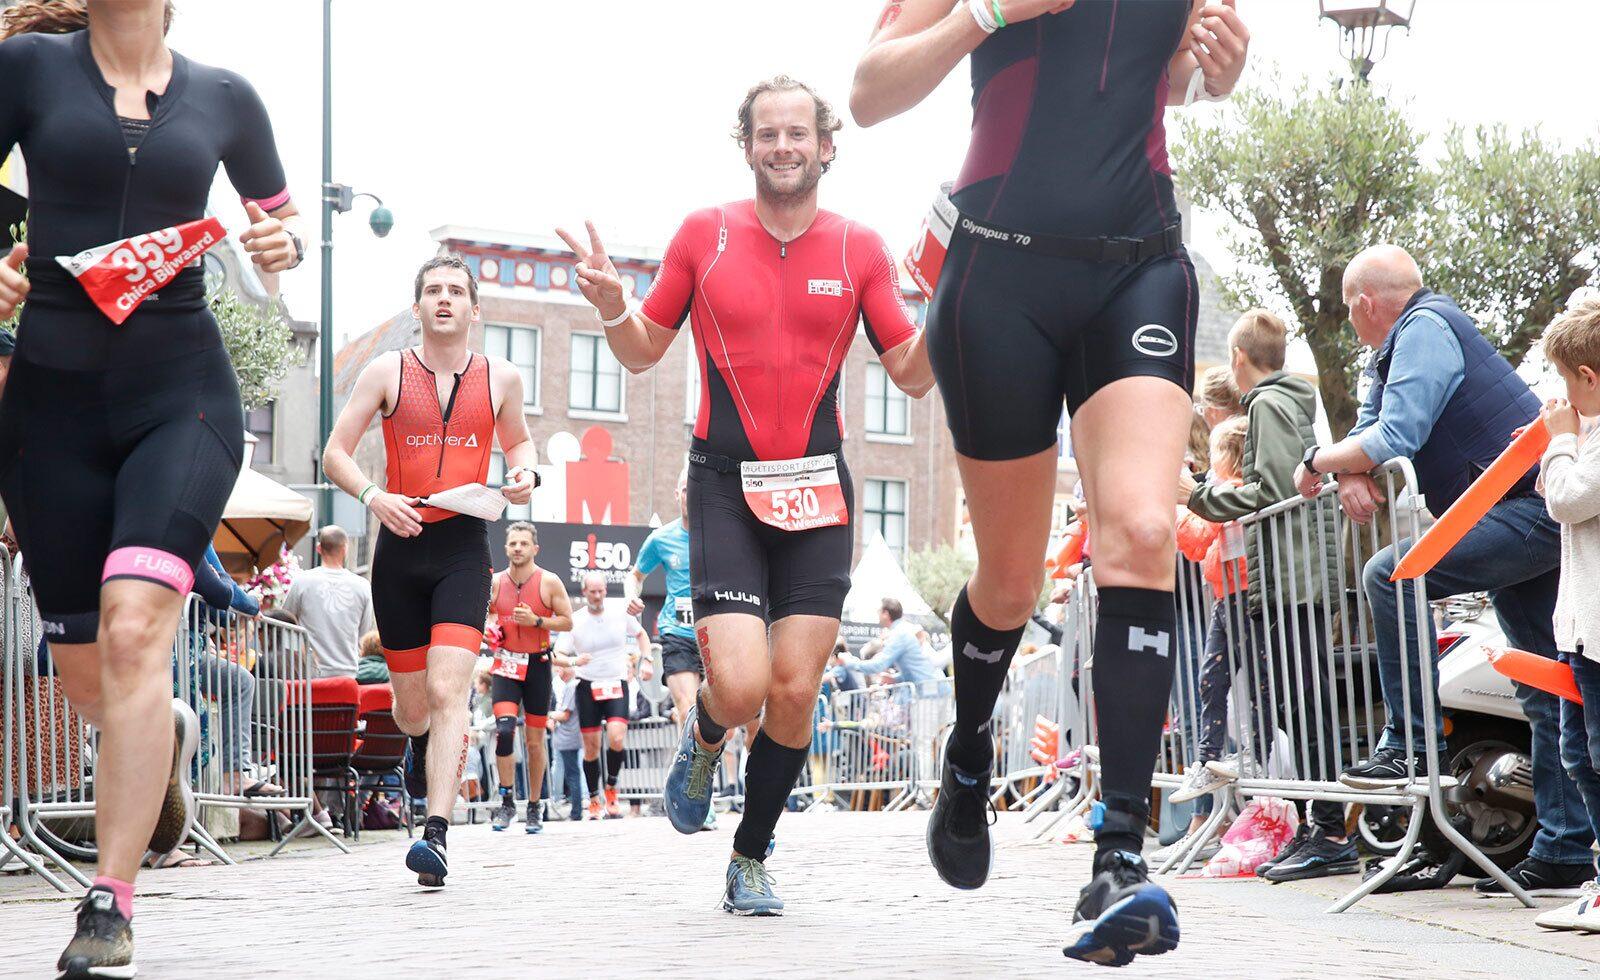 Ironman 2020 Hoorn-Medemblik